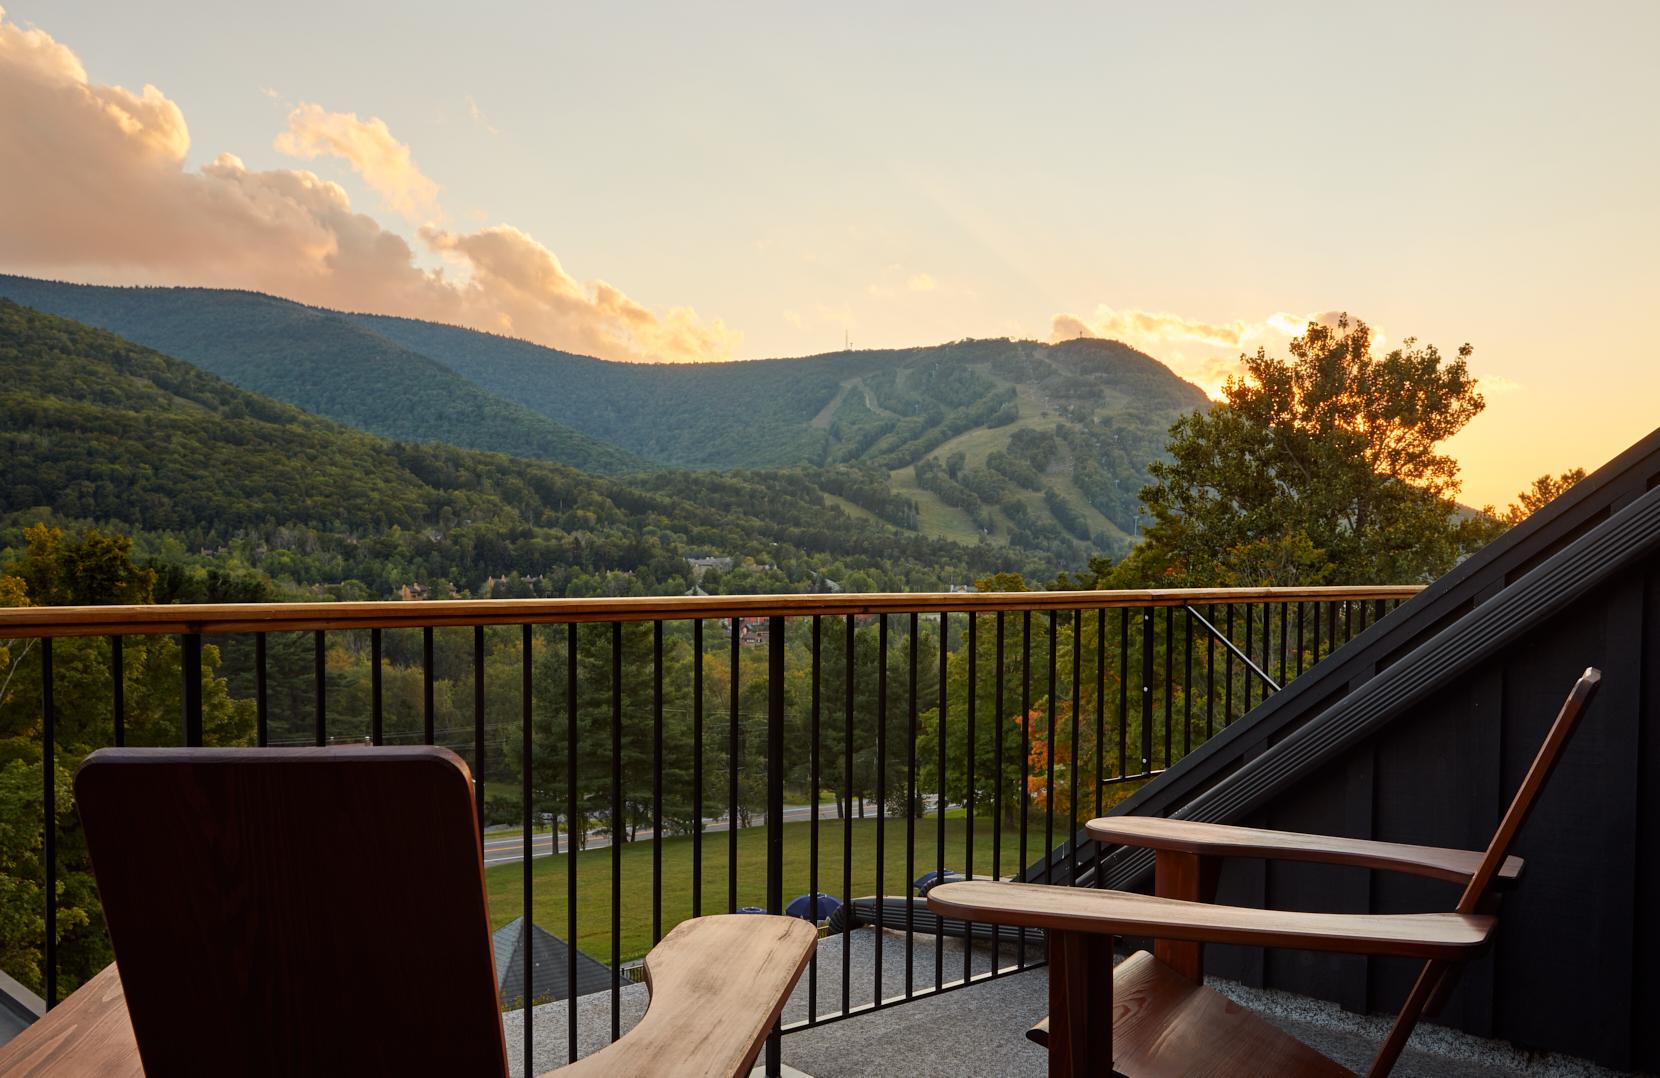 Mountain room terrace1_(c) ReadMcKendree.jpg